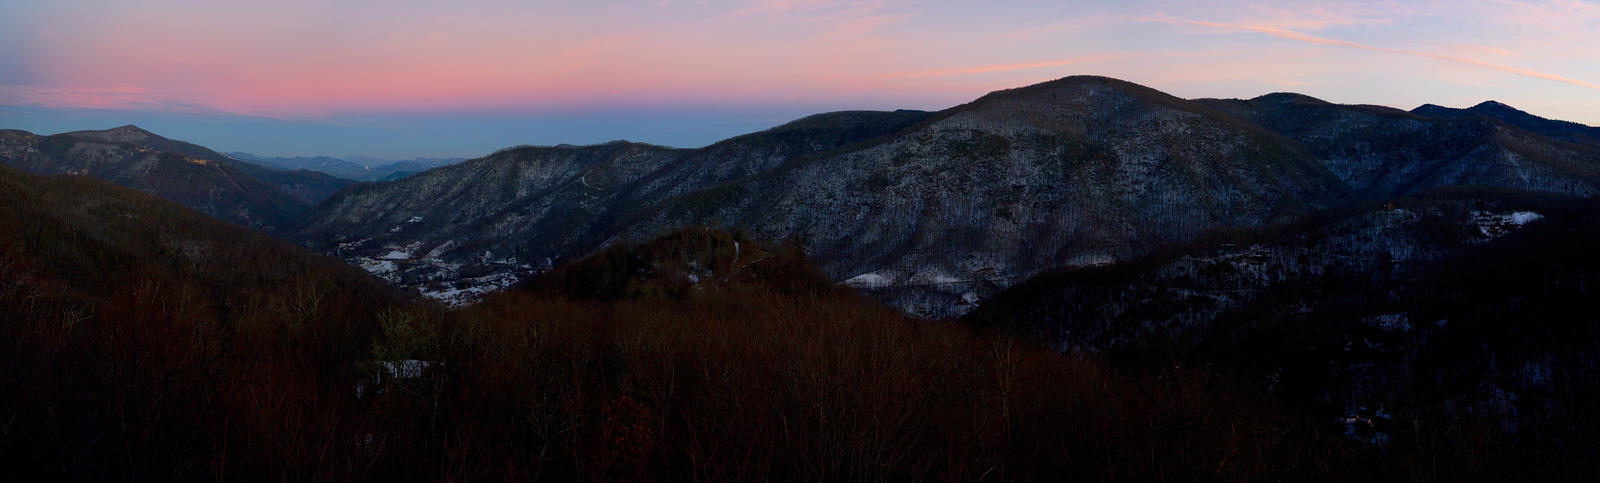 Mountain View by 200ok